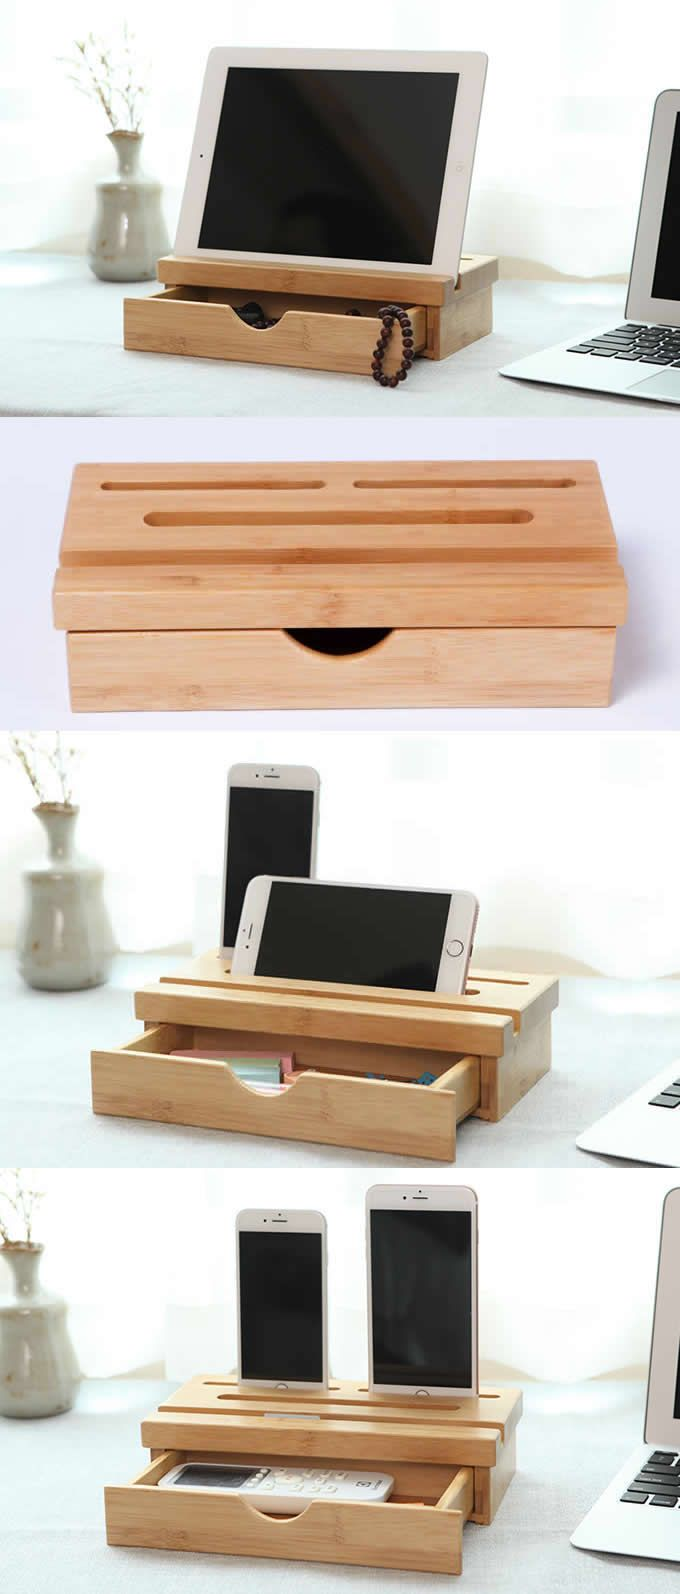 Wooden Bamboo Stationery Drawer Organizer iPad Phone Stand Holder